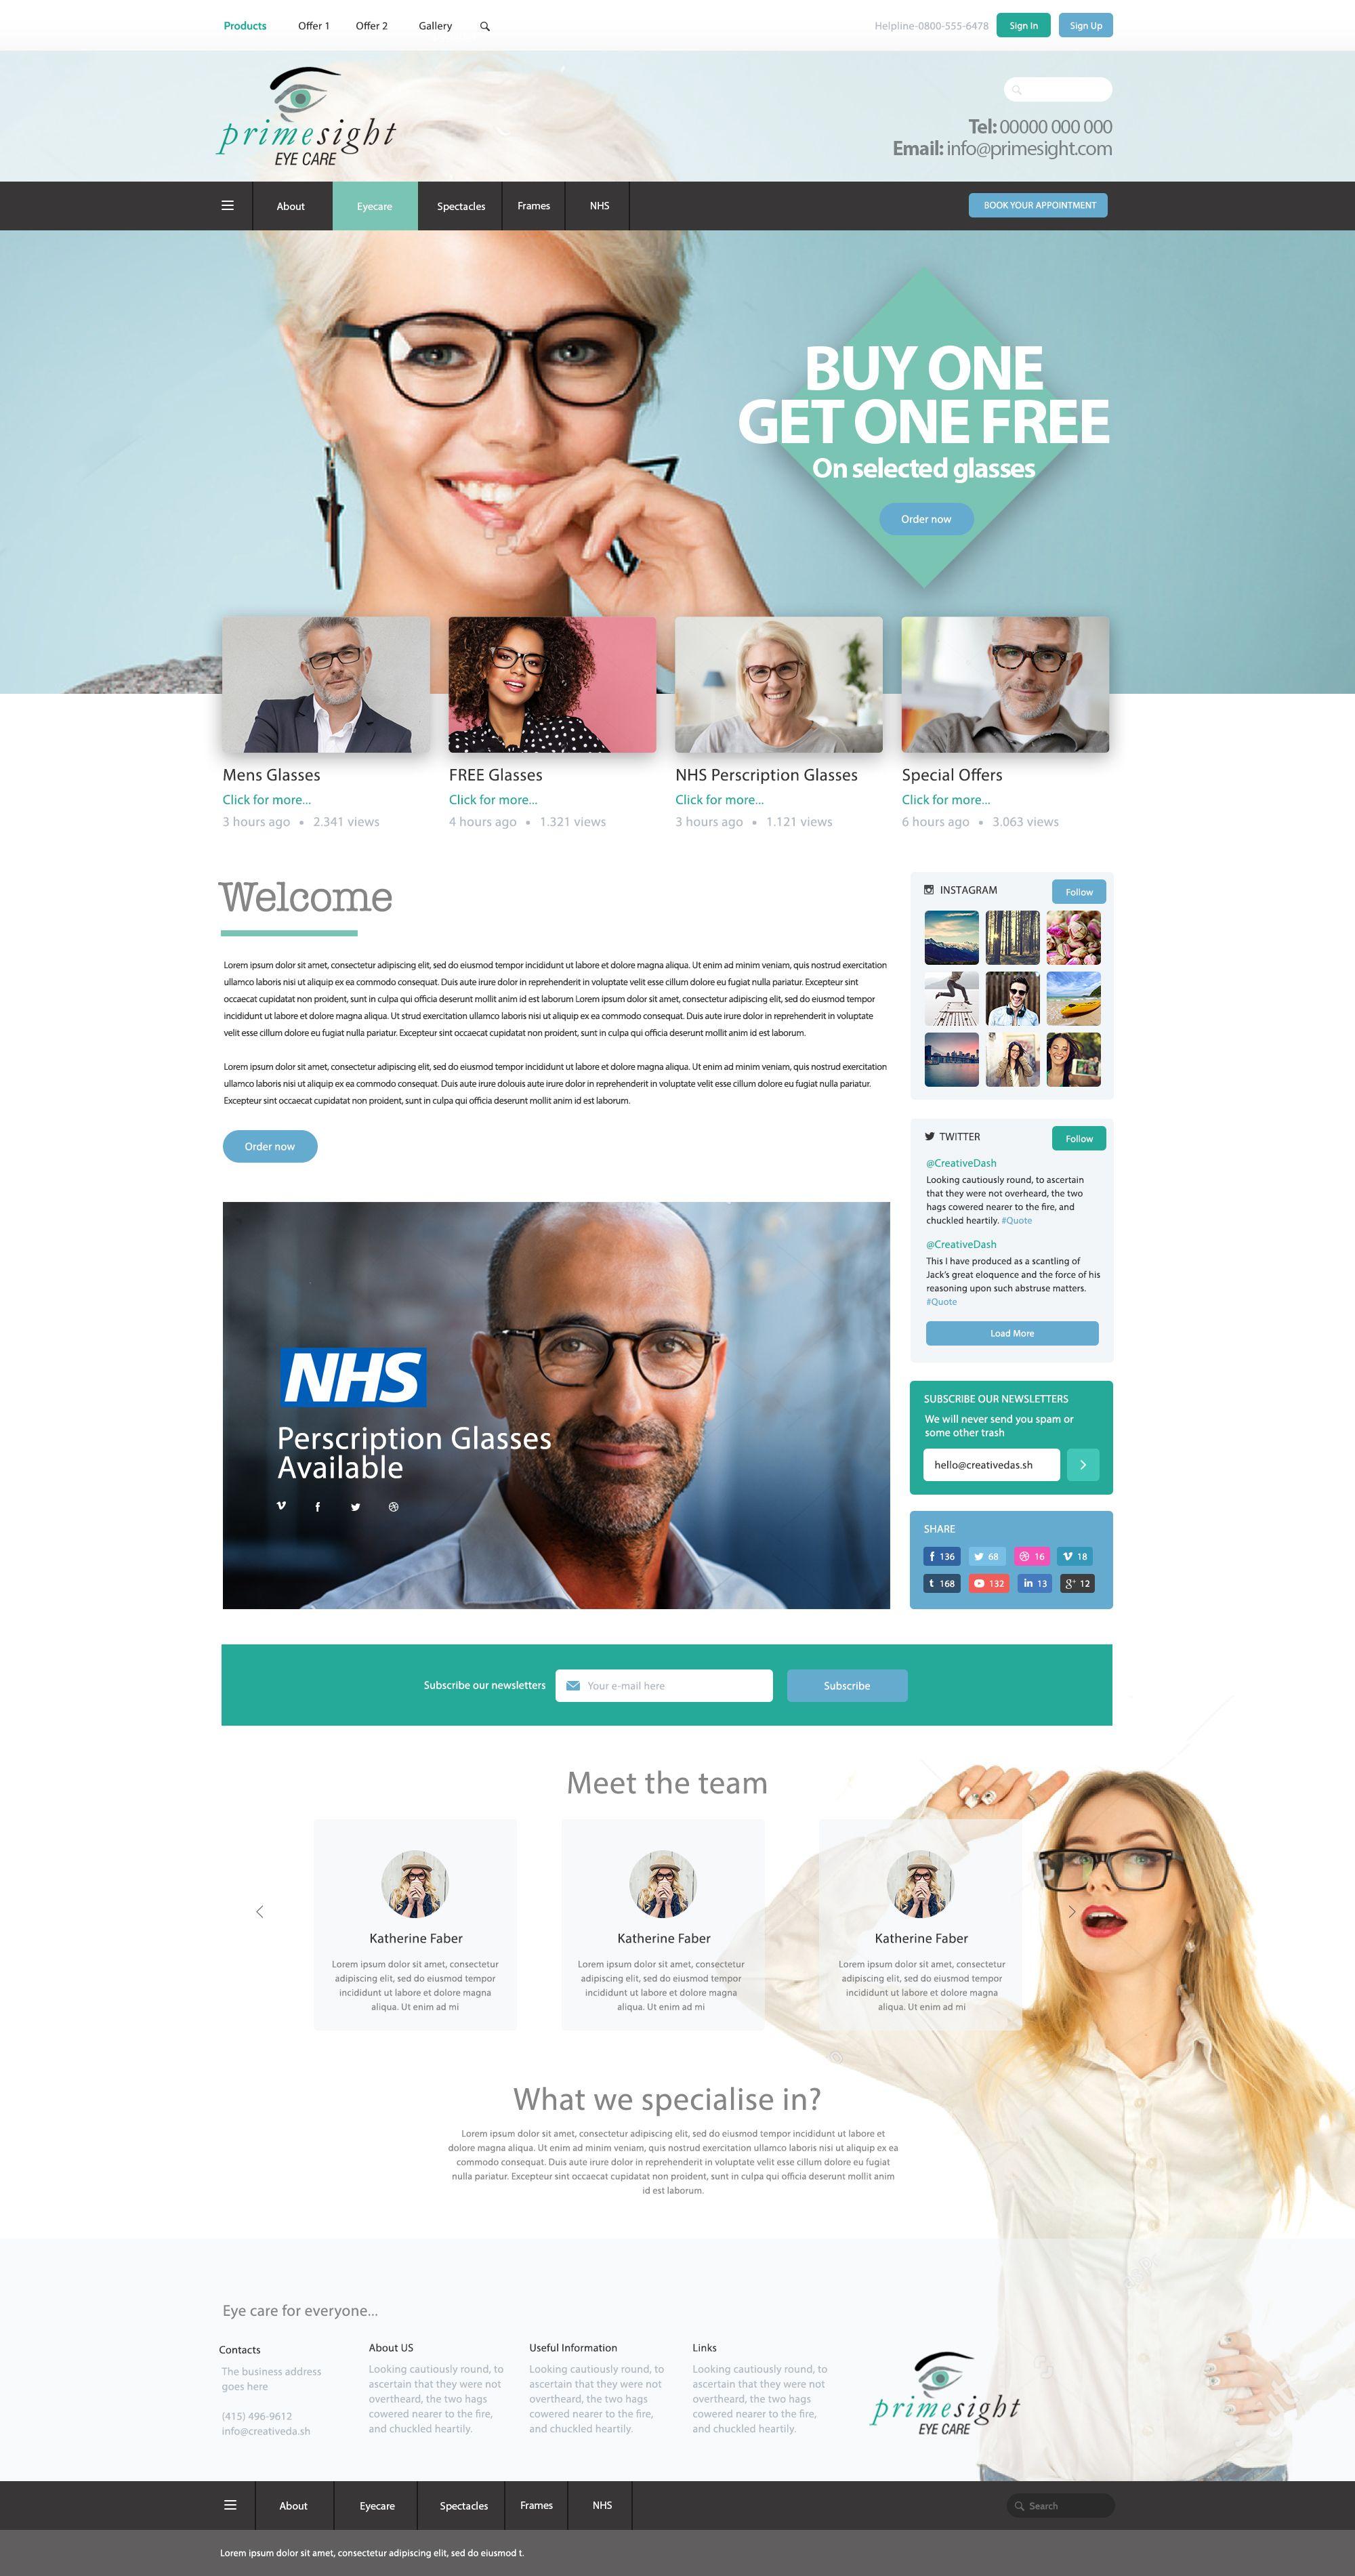 Web And App Design For A Eyecare Uk Company Webdesign Design Graphicdesign Webdevelopment Website Marketing Web Design Web Design Quotes Web App Design